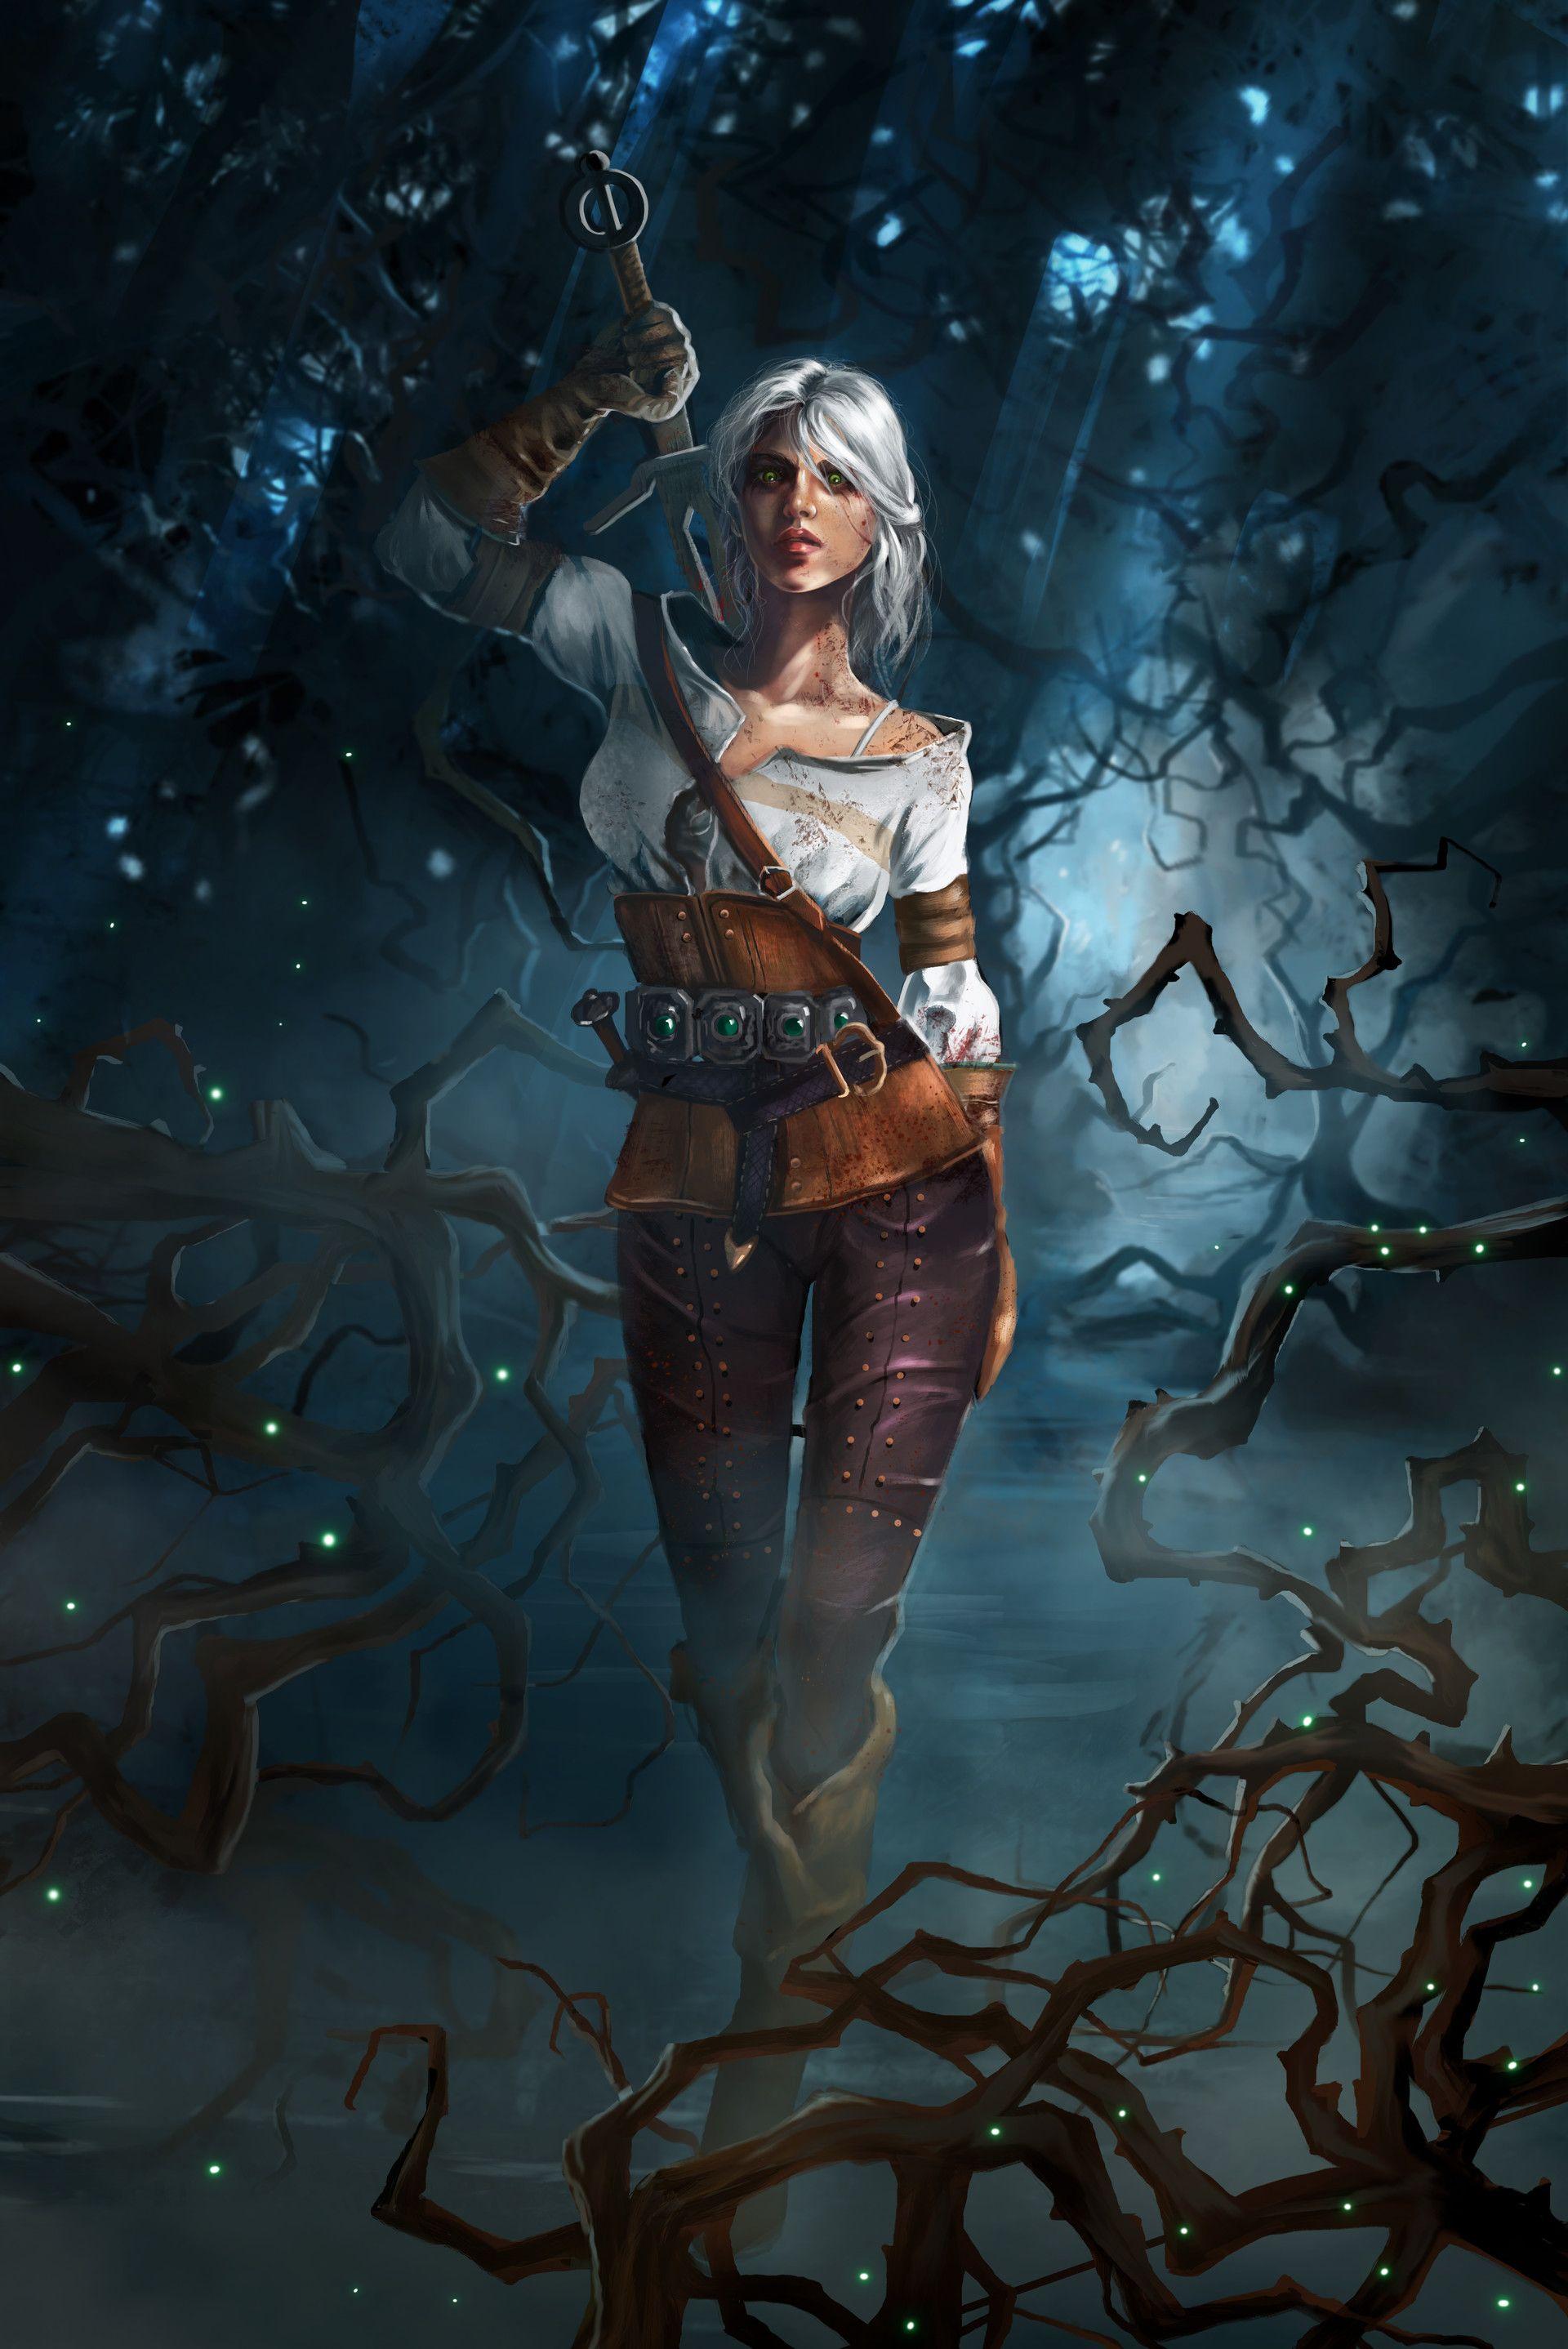 Artstation Ciri The Witcher 3 Fanart Grazia Ferlito The Witcher Game The Witcher Geralt The Witcher Ciri witcher 3 hd games artwork